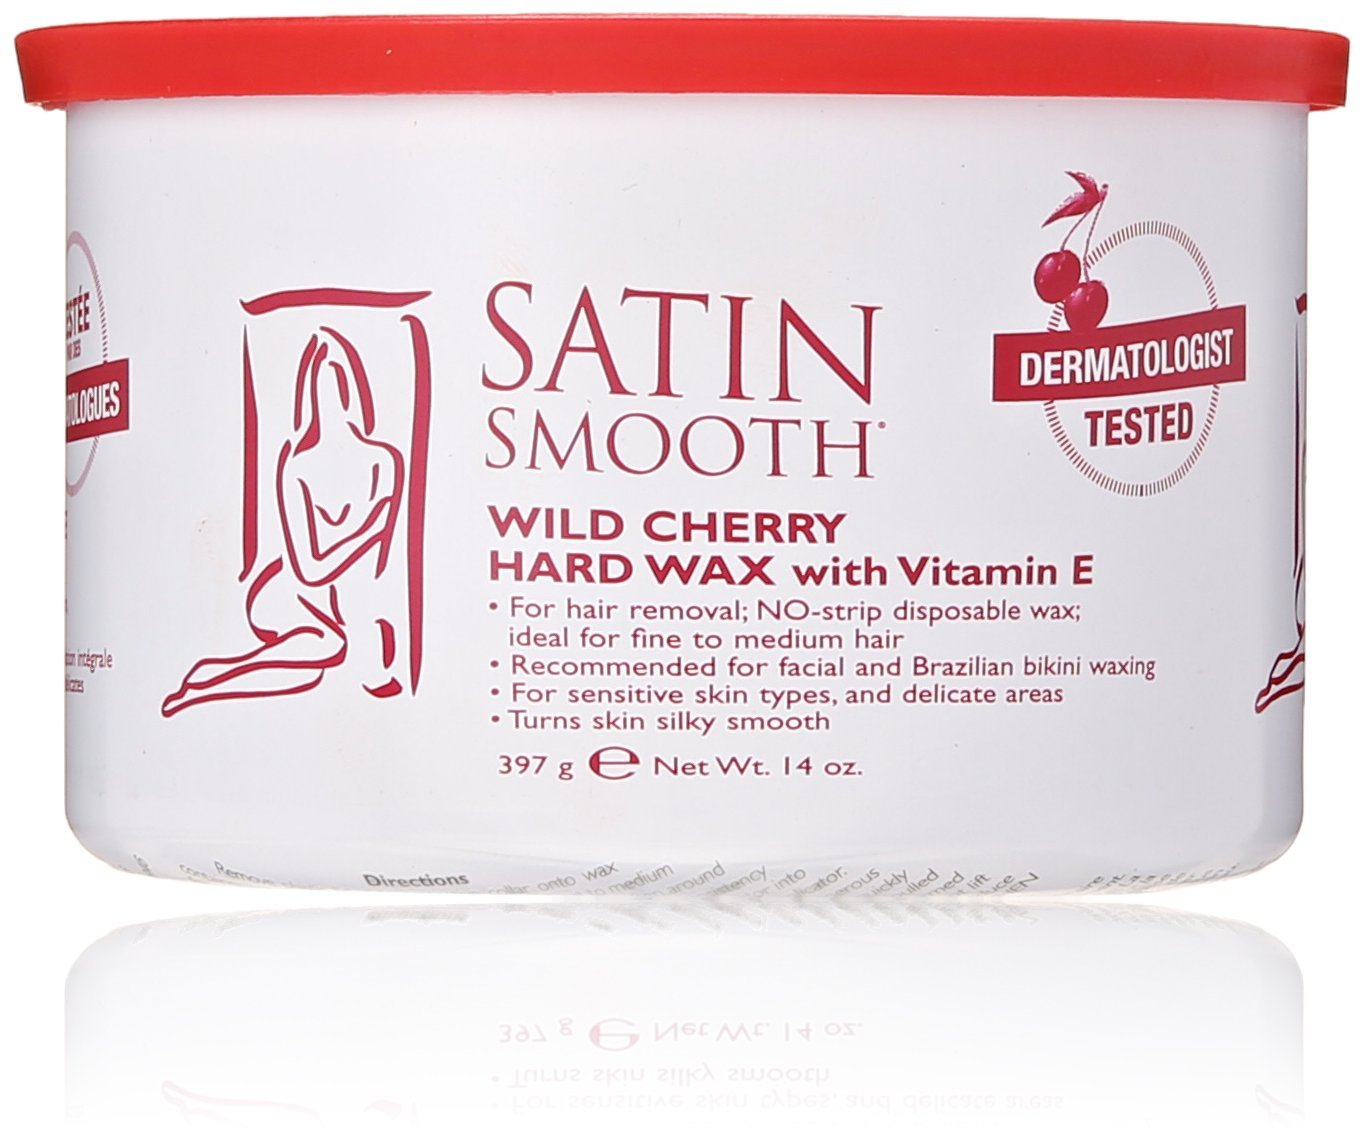 Satin Smooth Wild Cherry Hard Wax with Vitamin E, 14 oz. SSW14CHG